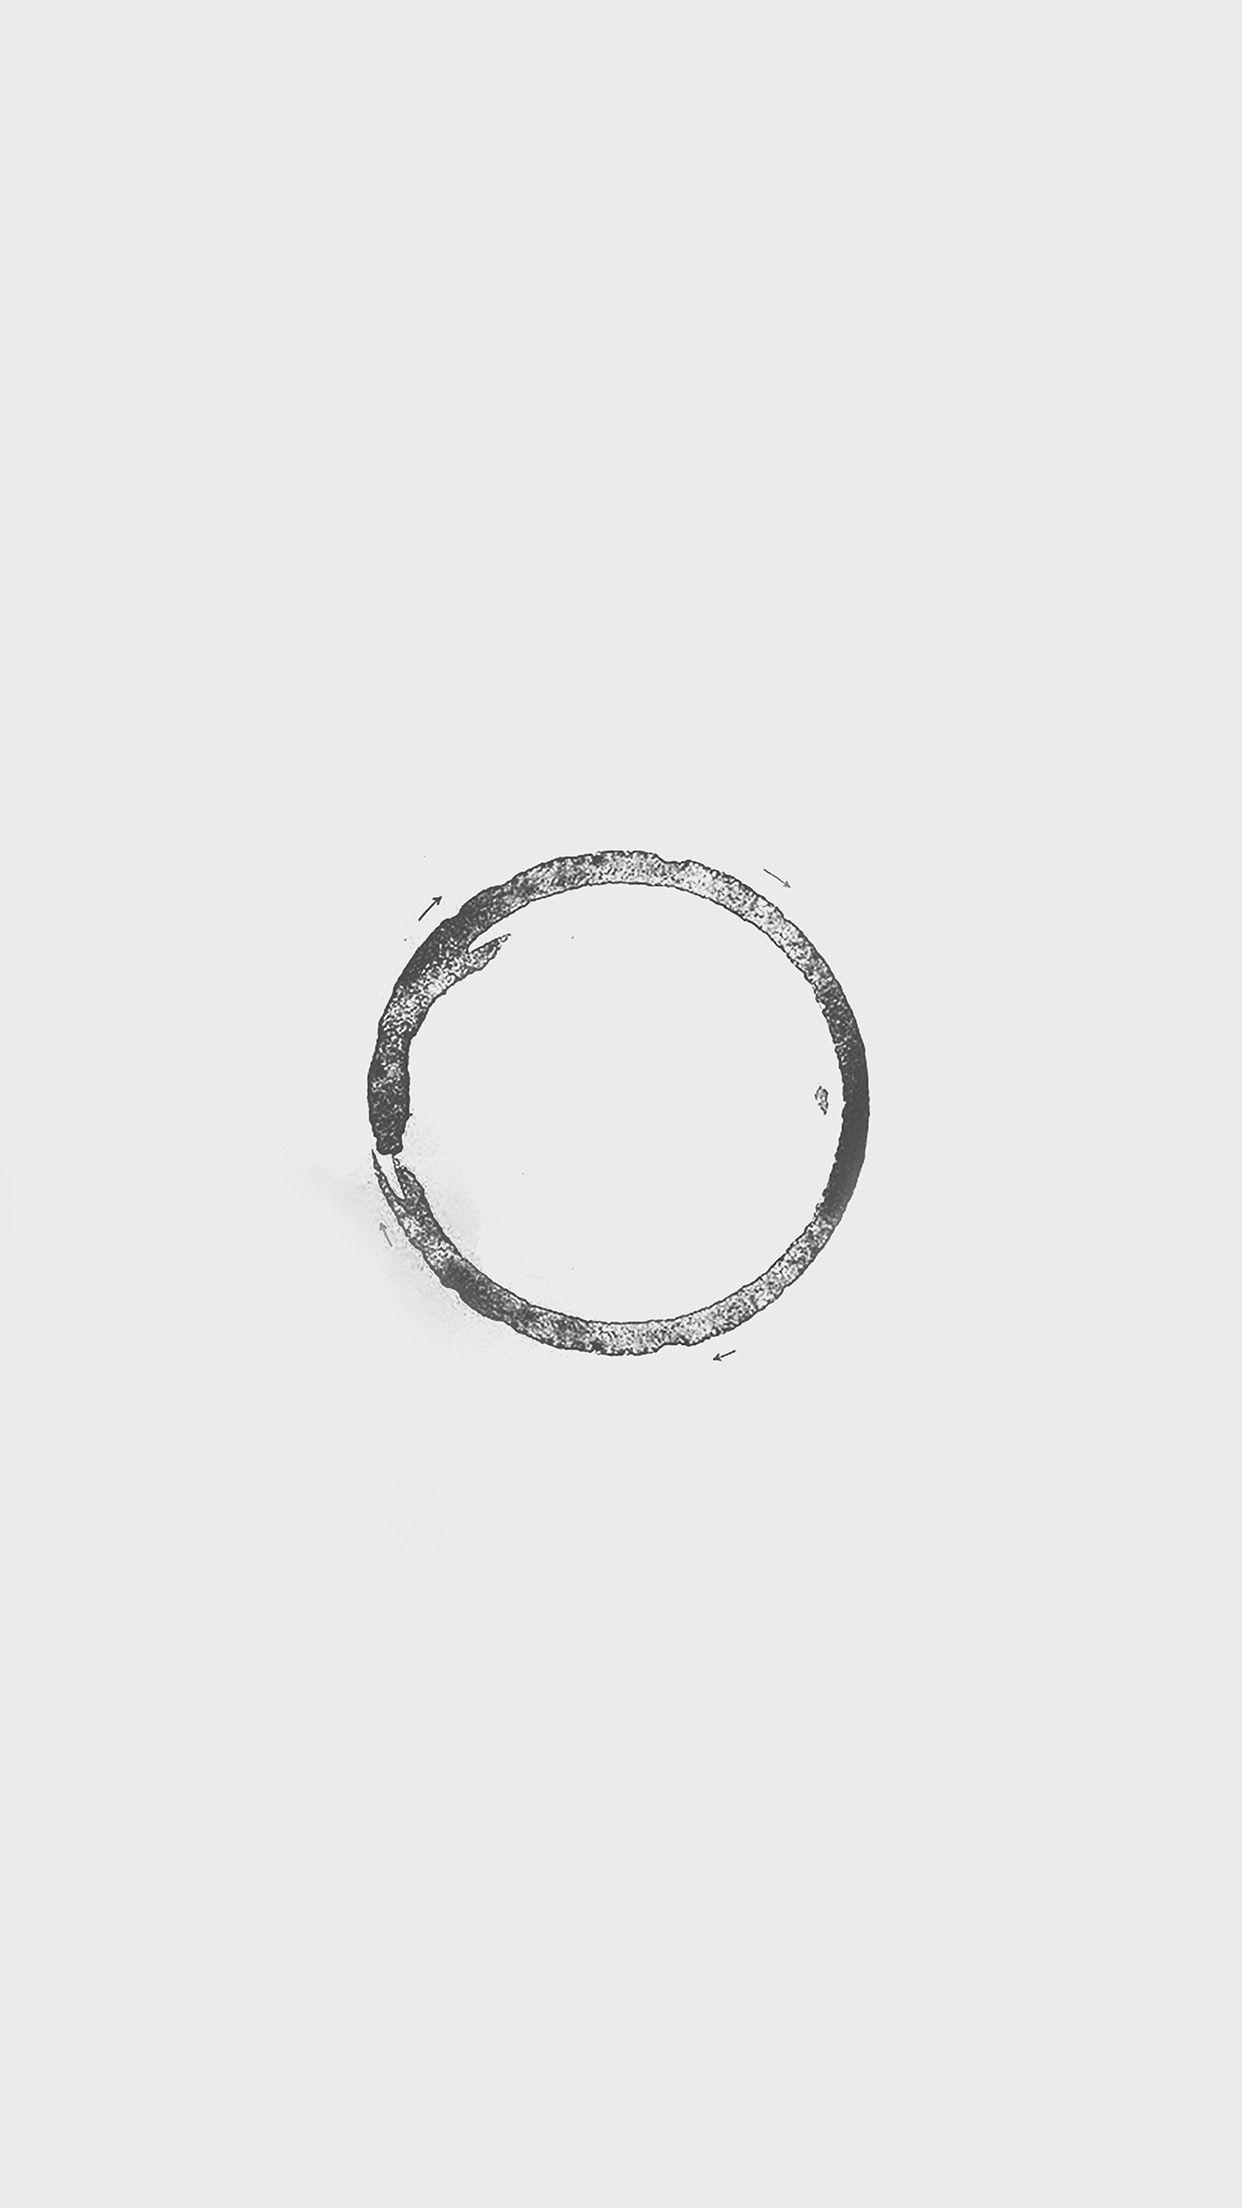 Circle Art Minimalist Iphone Hipster Wallpaper Iphone 7 Plus